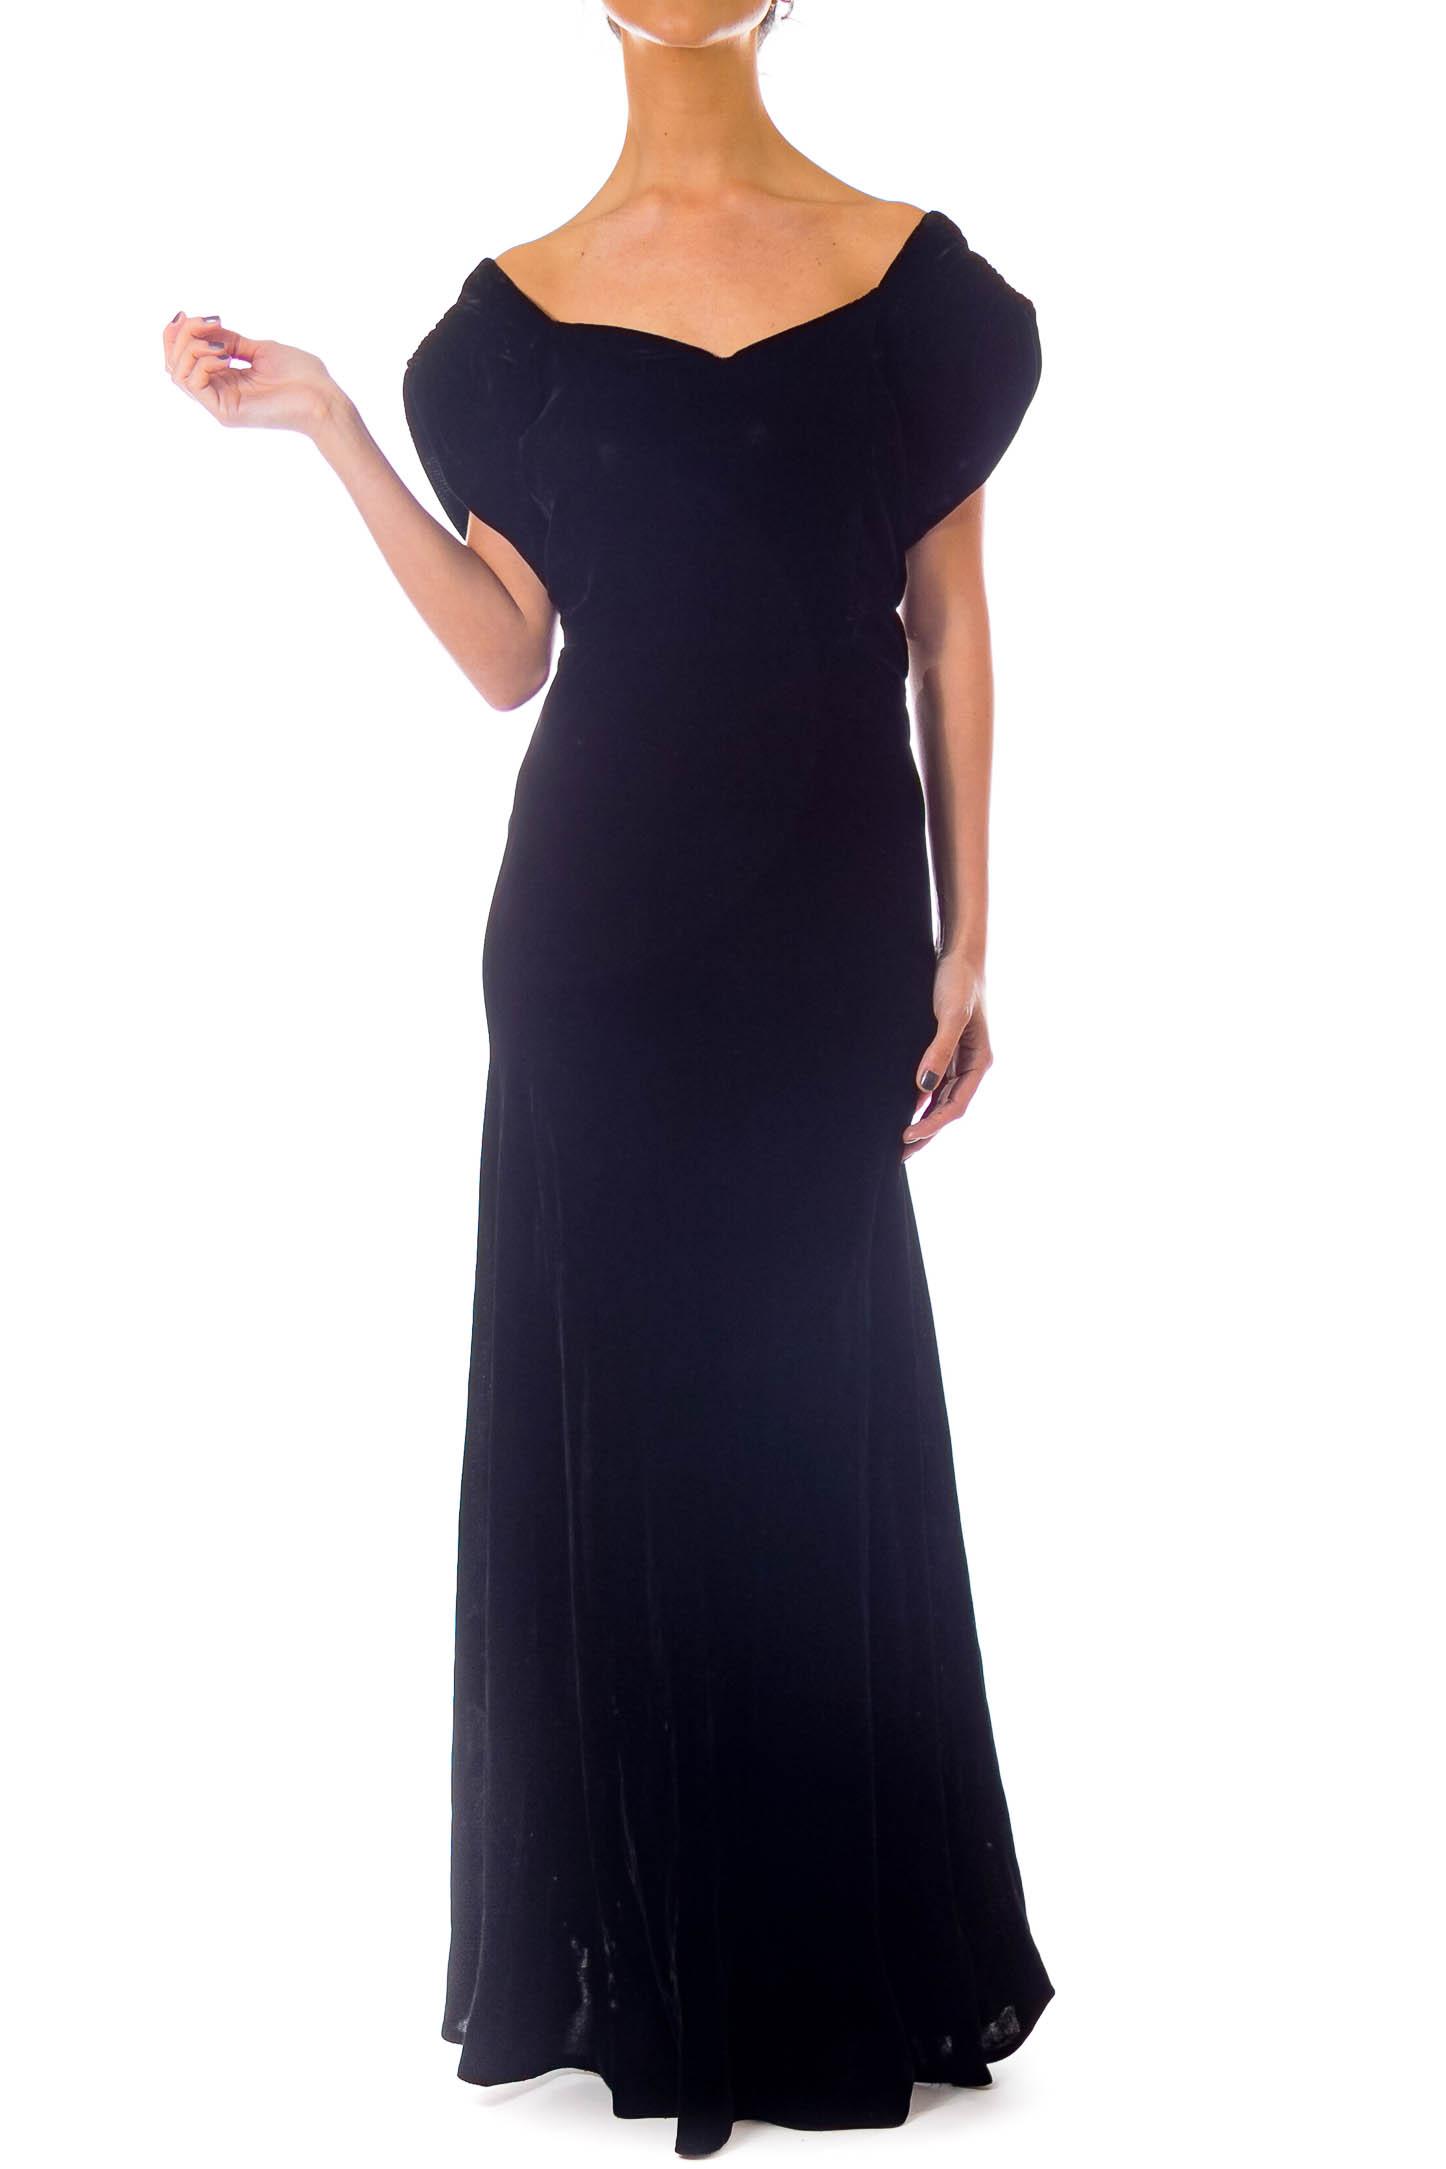 Black Vintage Velvet Gown - SilkRoll